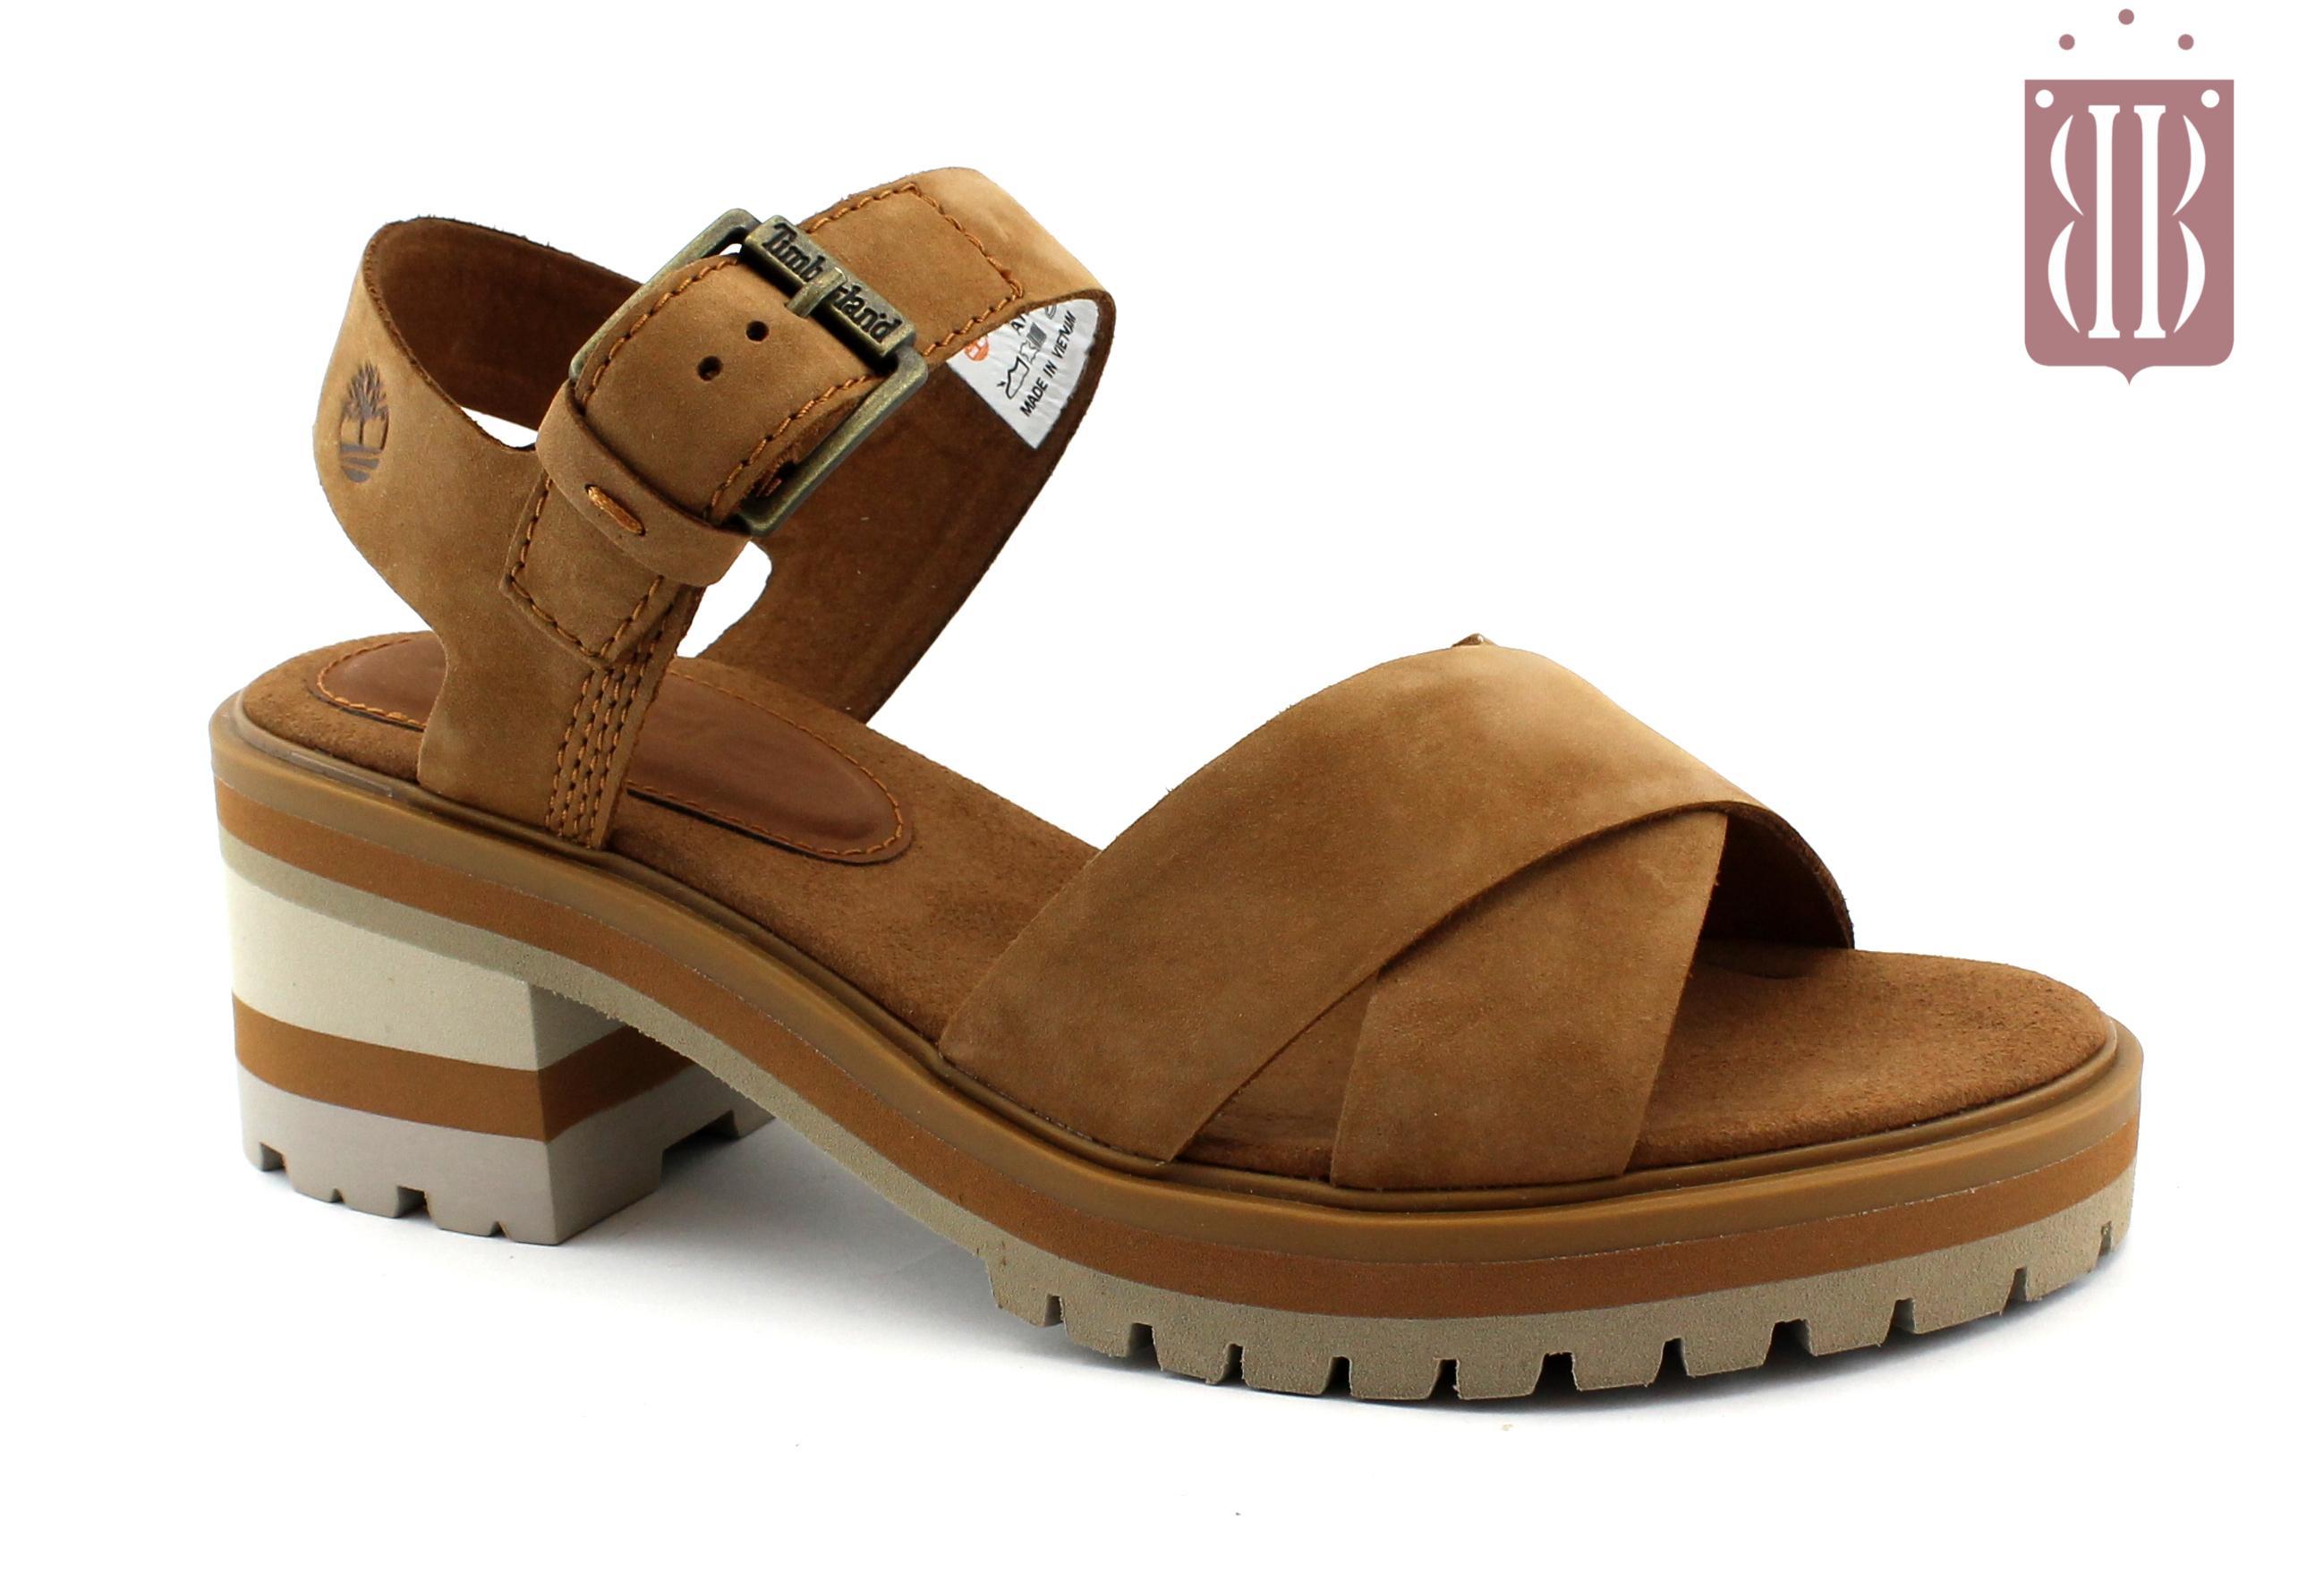 TIMBERLAND VIOLET MARSH 0A1SN2 rust cuoio scarpe donna sandali fibbia tacco pelle nubuck